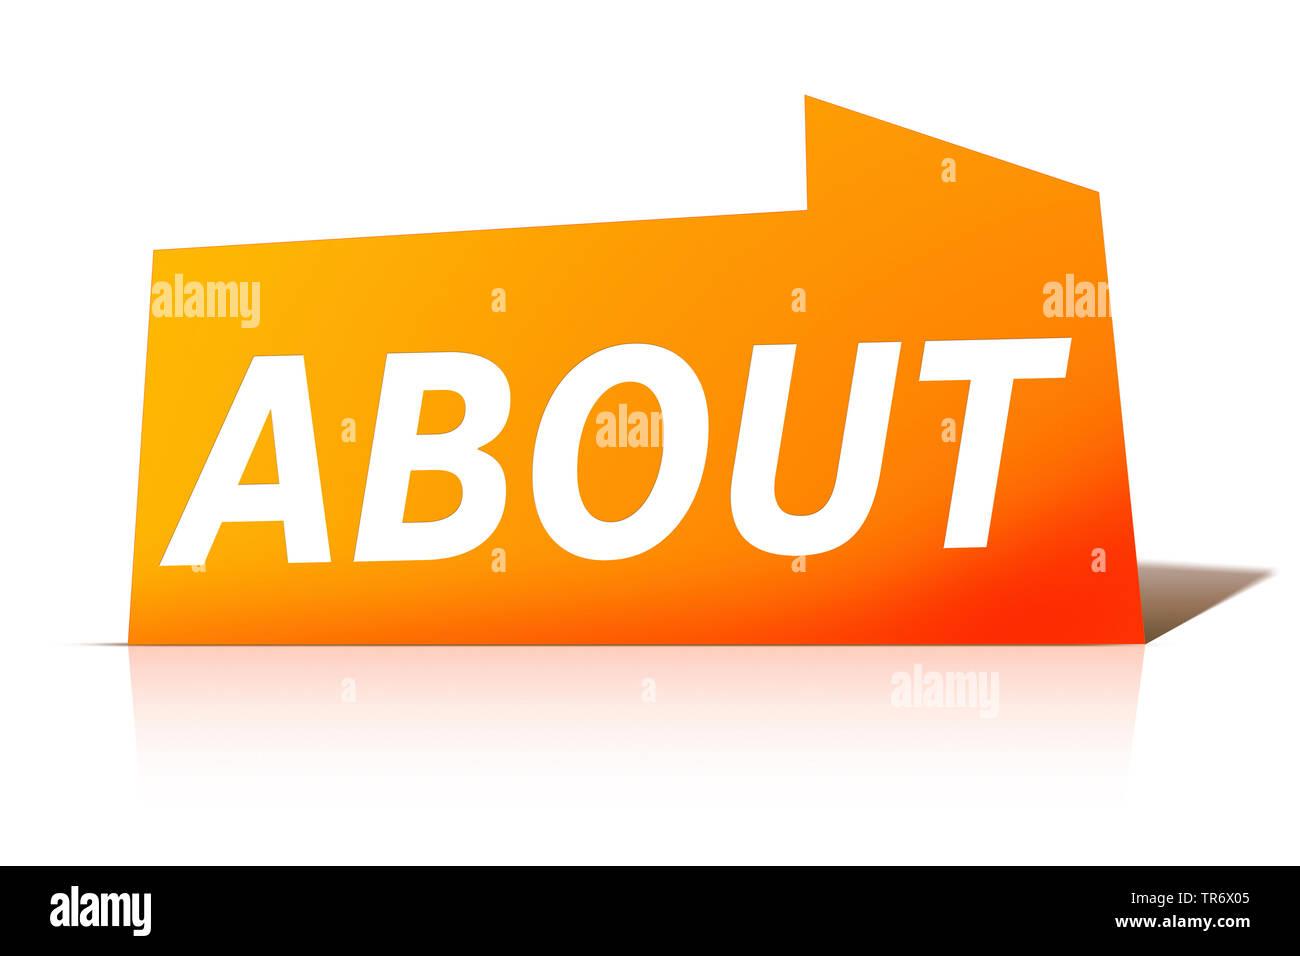 3D Computergrafik, orange Sprechblase mit Text ABOUT - UeBER, Europa | 3D computer graphic, orange speech bubble reading ABOUT, Europe | BLWS491612.jp - Stock Image